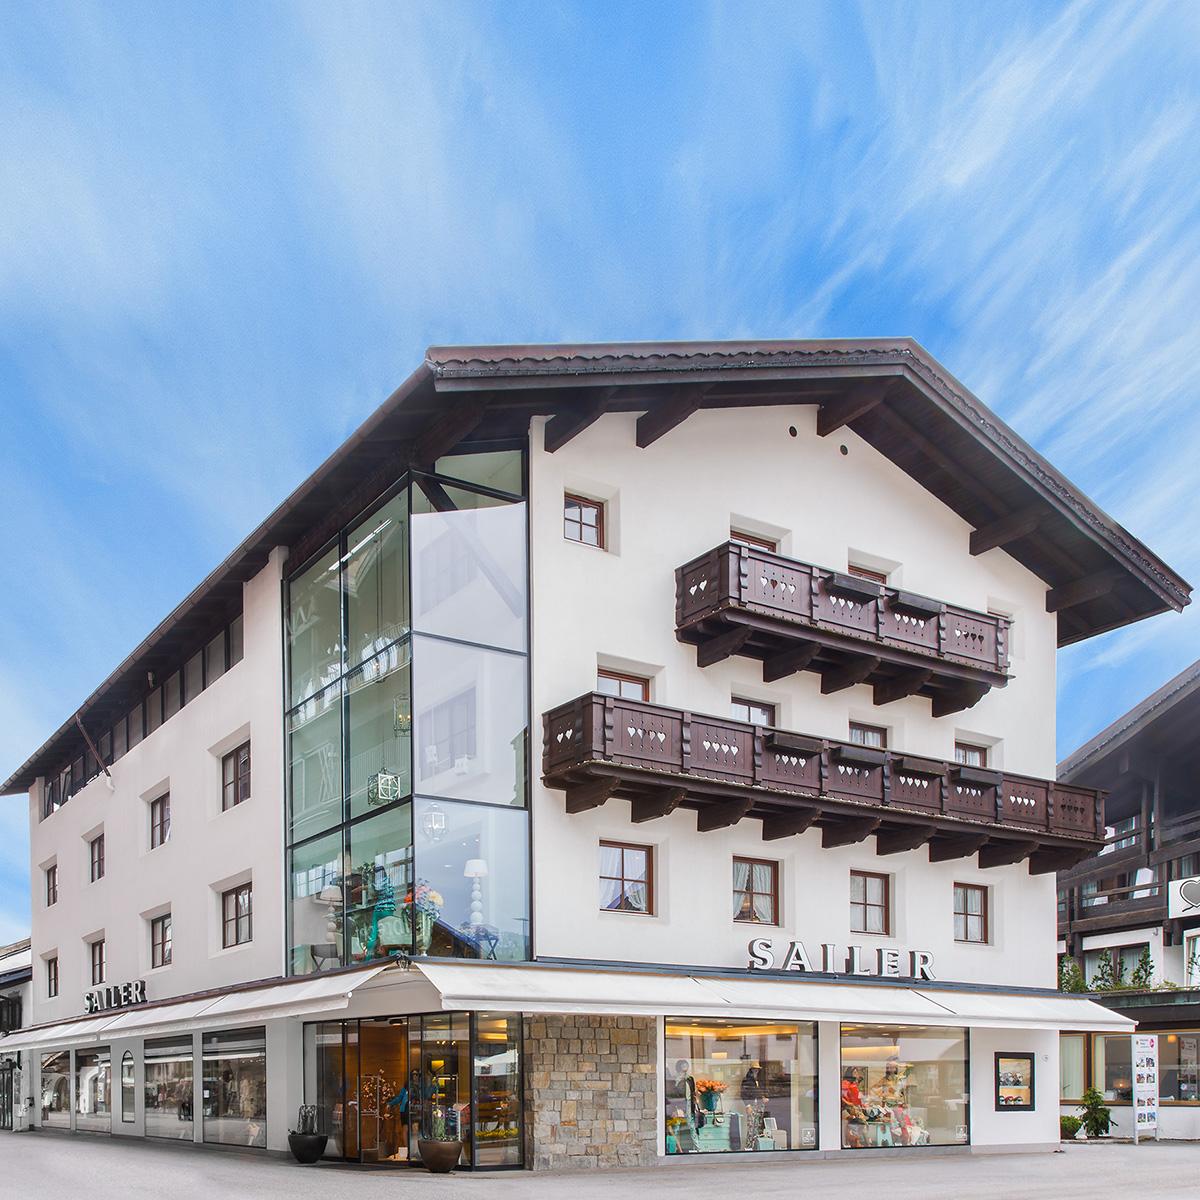 SAILER-Seefeld-Image-Hoover-Startseite-tirol-Austria-zoom